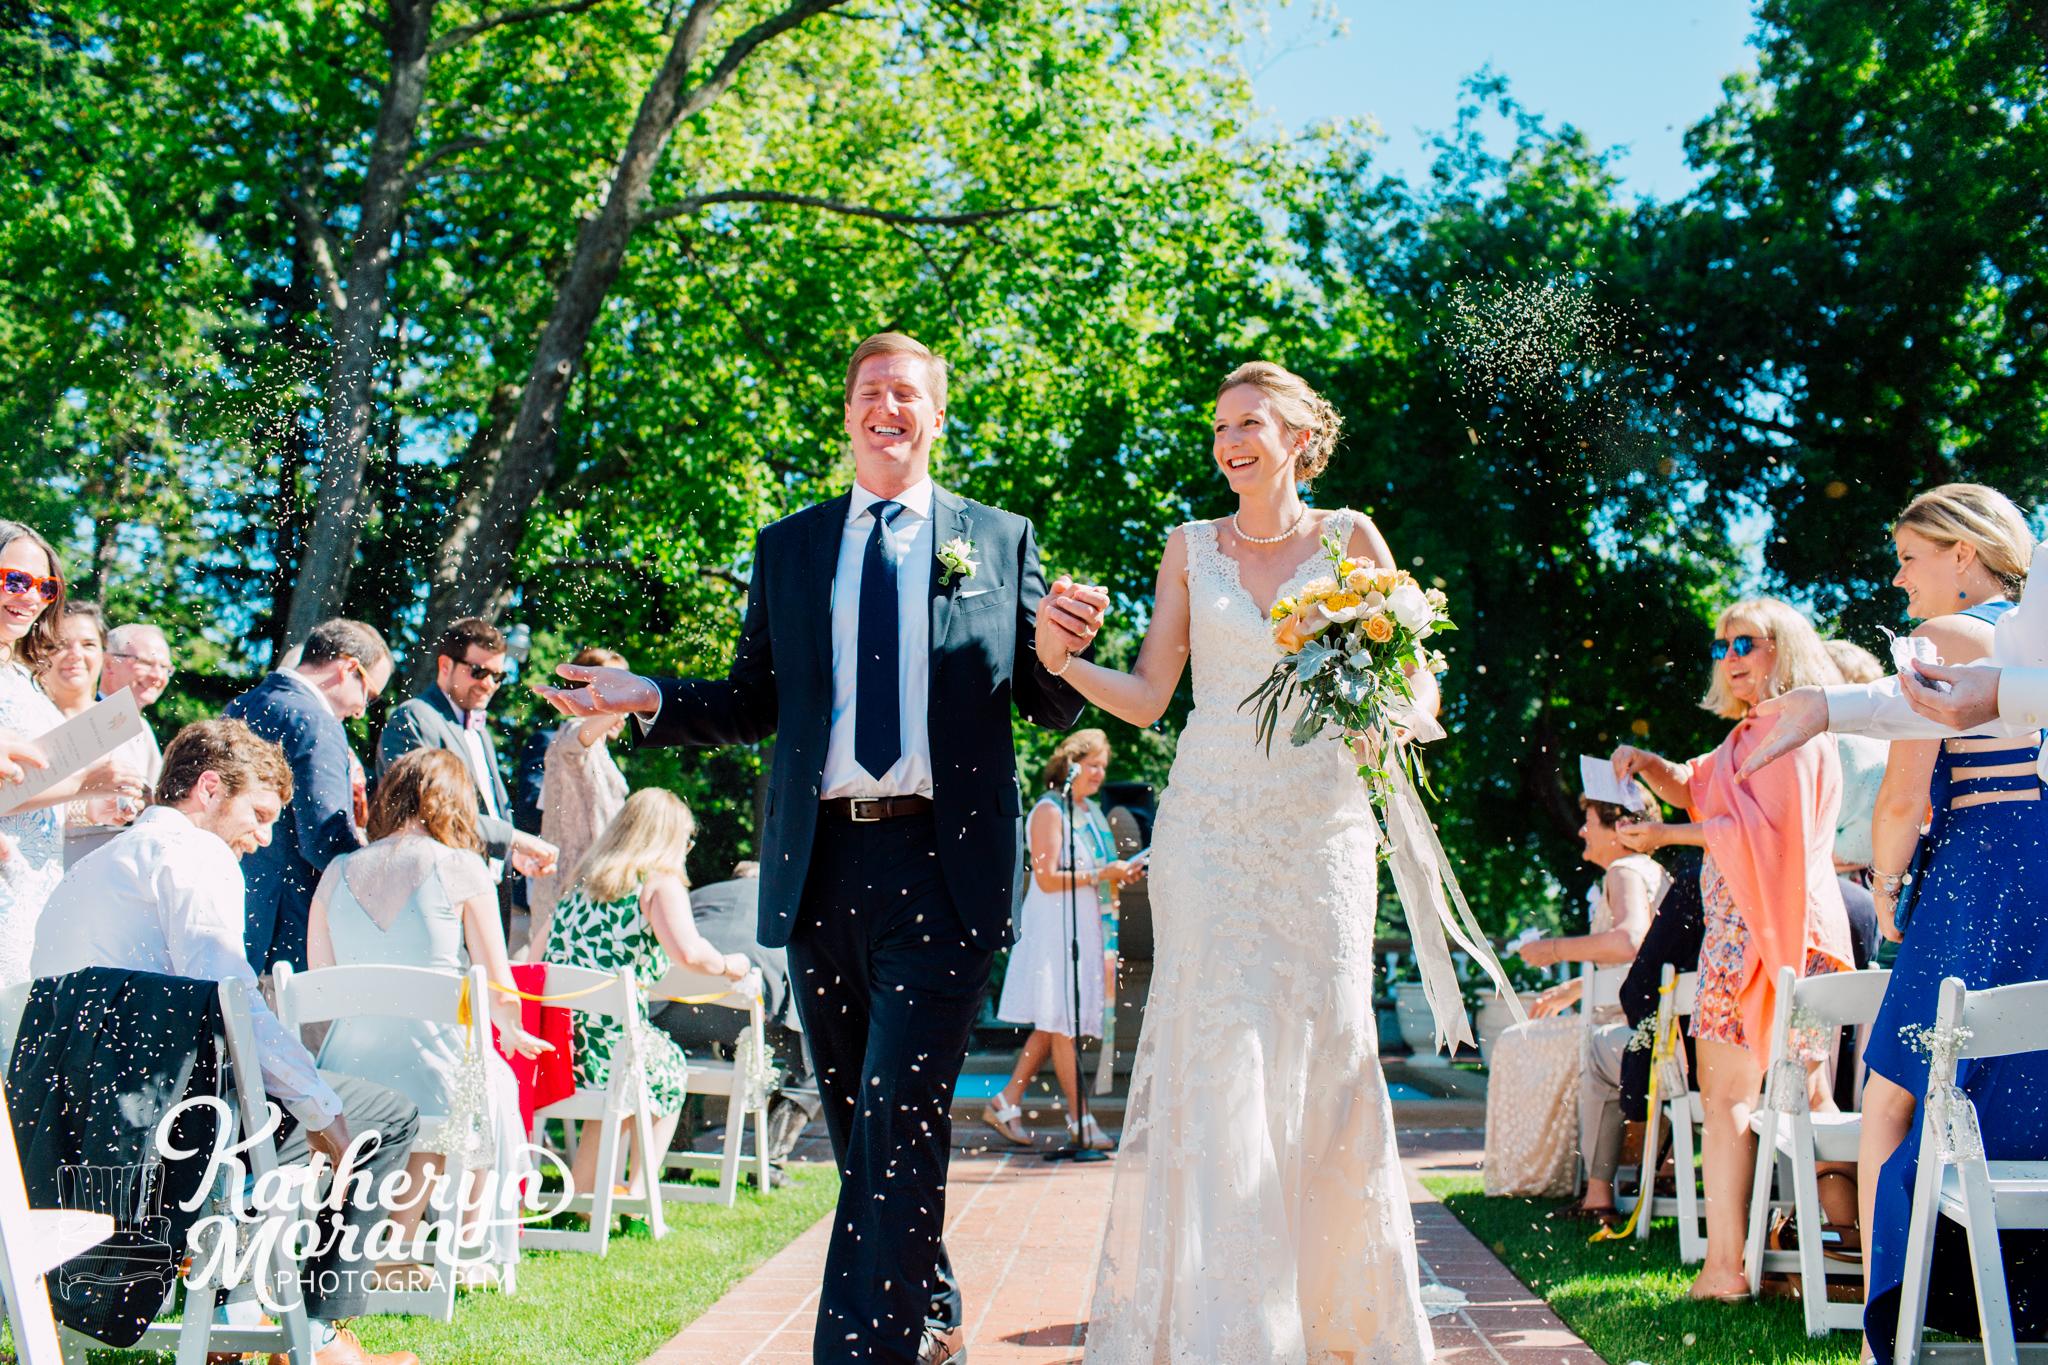 bellingham-wedding-photographer-lairmont-manor-katheryn-moran-18.jpg